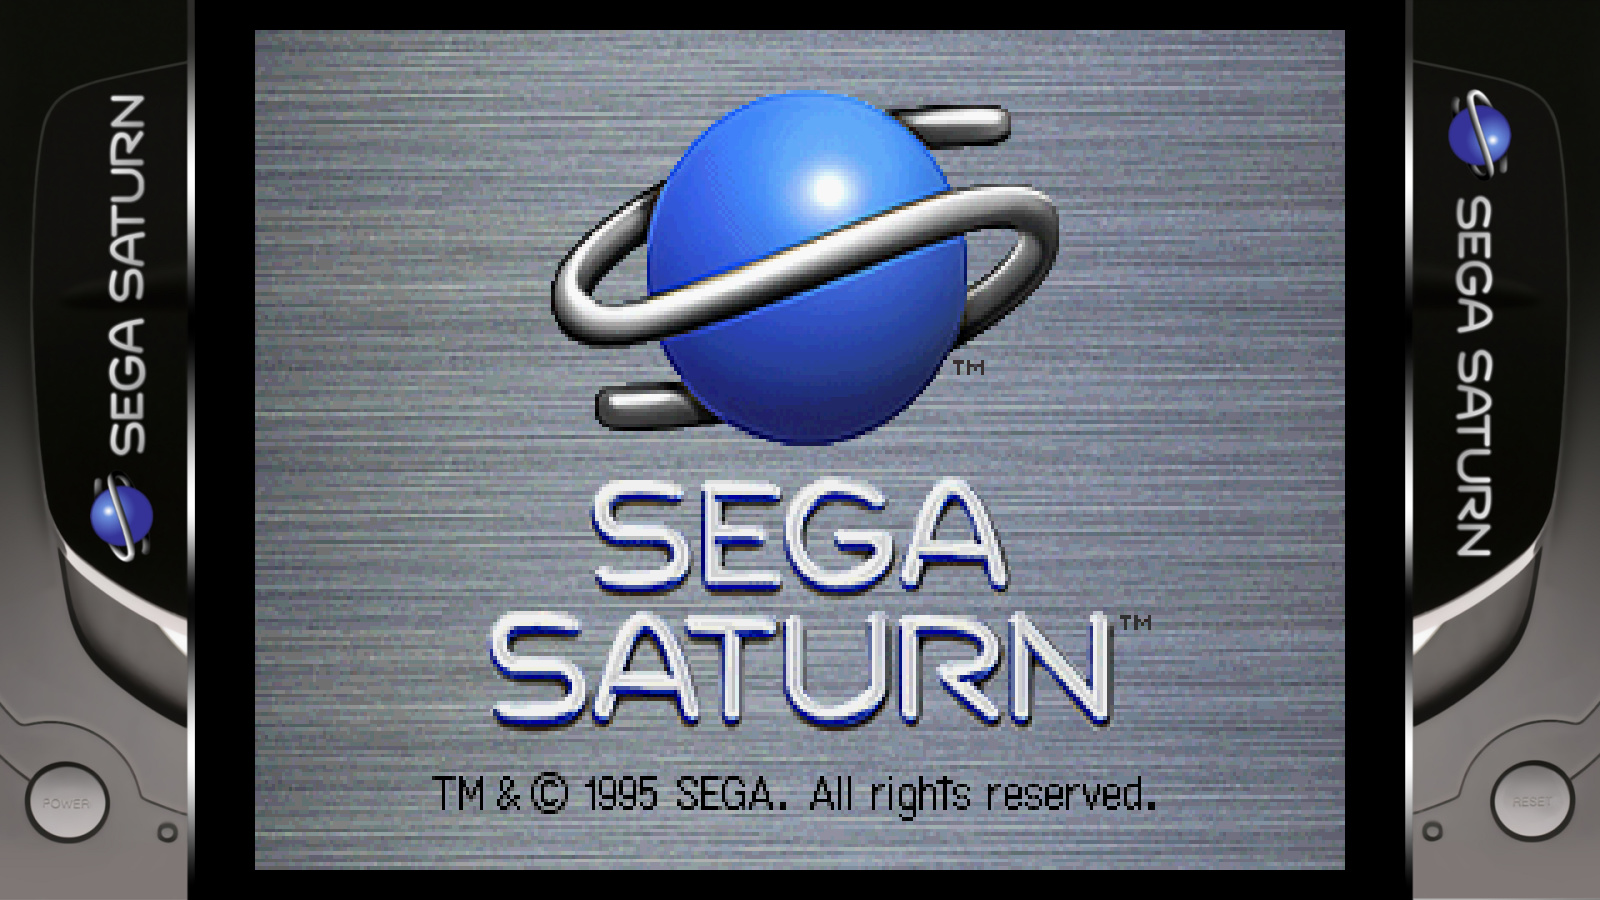 Multi disc for Sony Playstation and Sega Saturn using M3U files